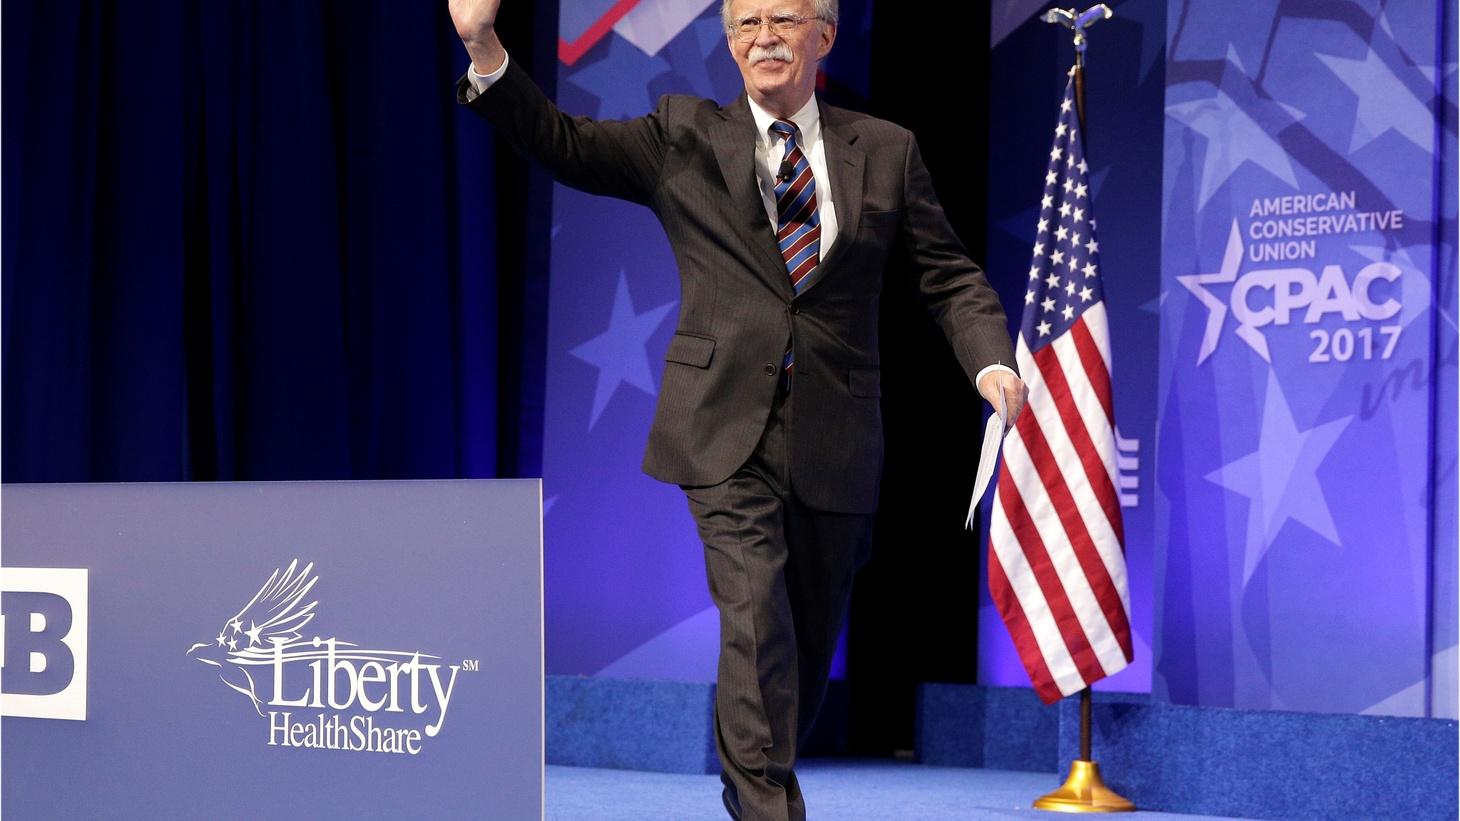 John Bolton- a hawk's hawk- becomes Trump's National Security Advisor.